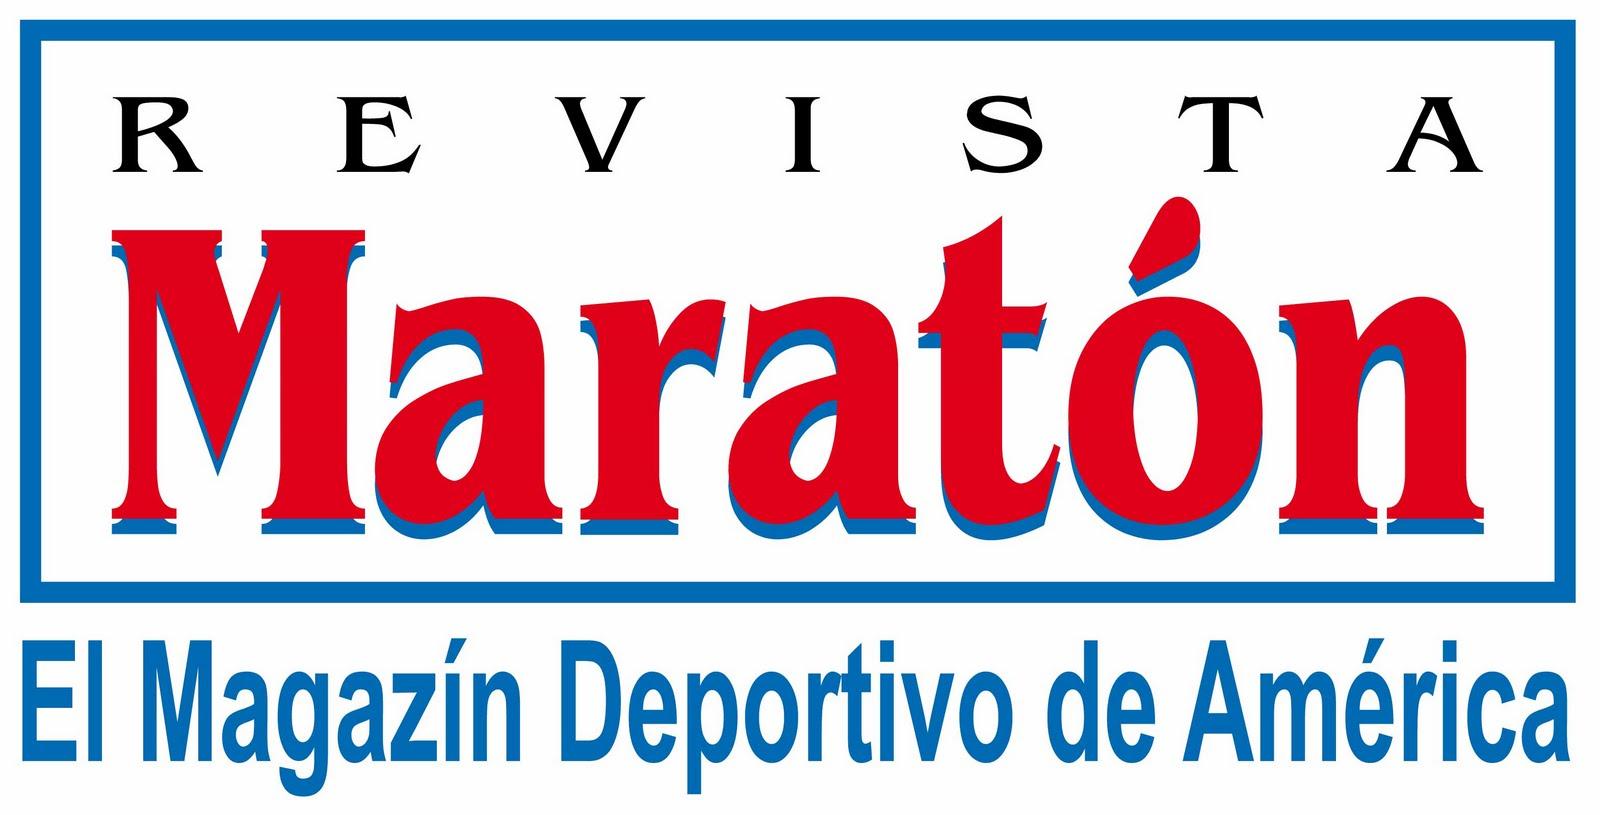 Revista Maraton